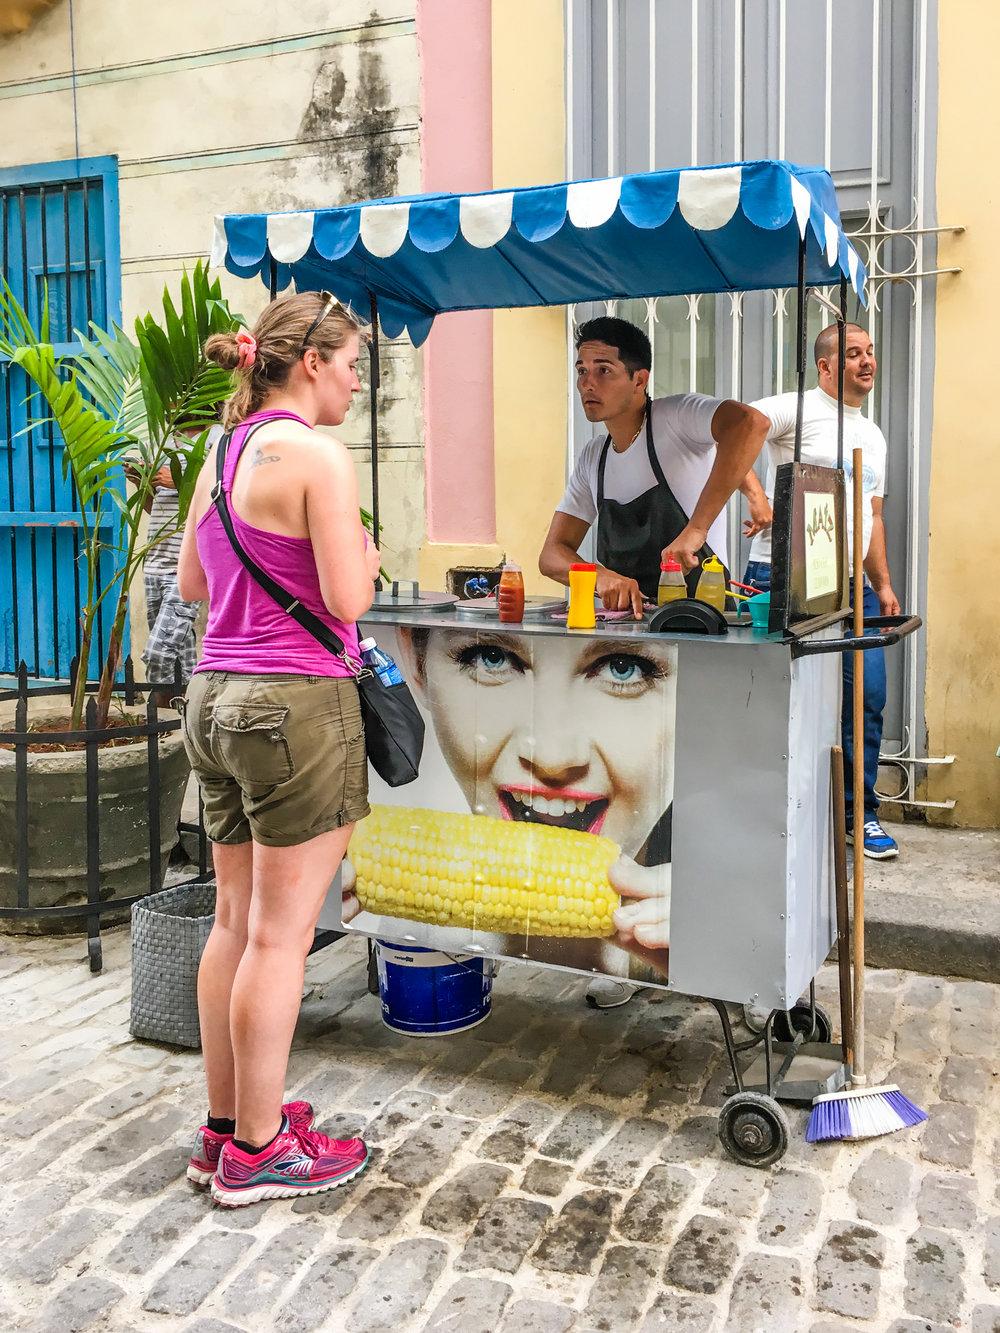 Ordering corn from a food vendor in Havana